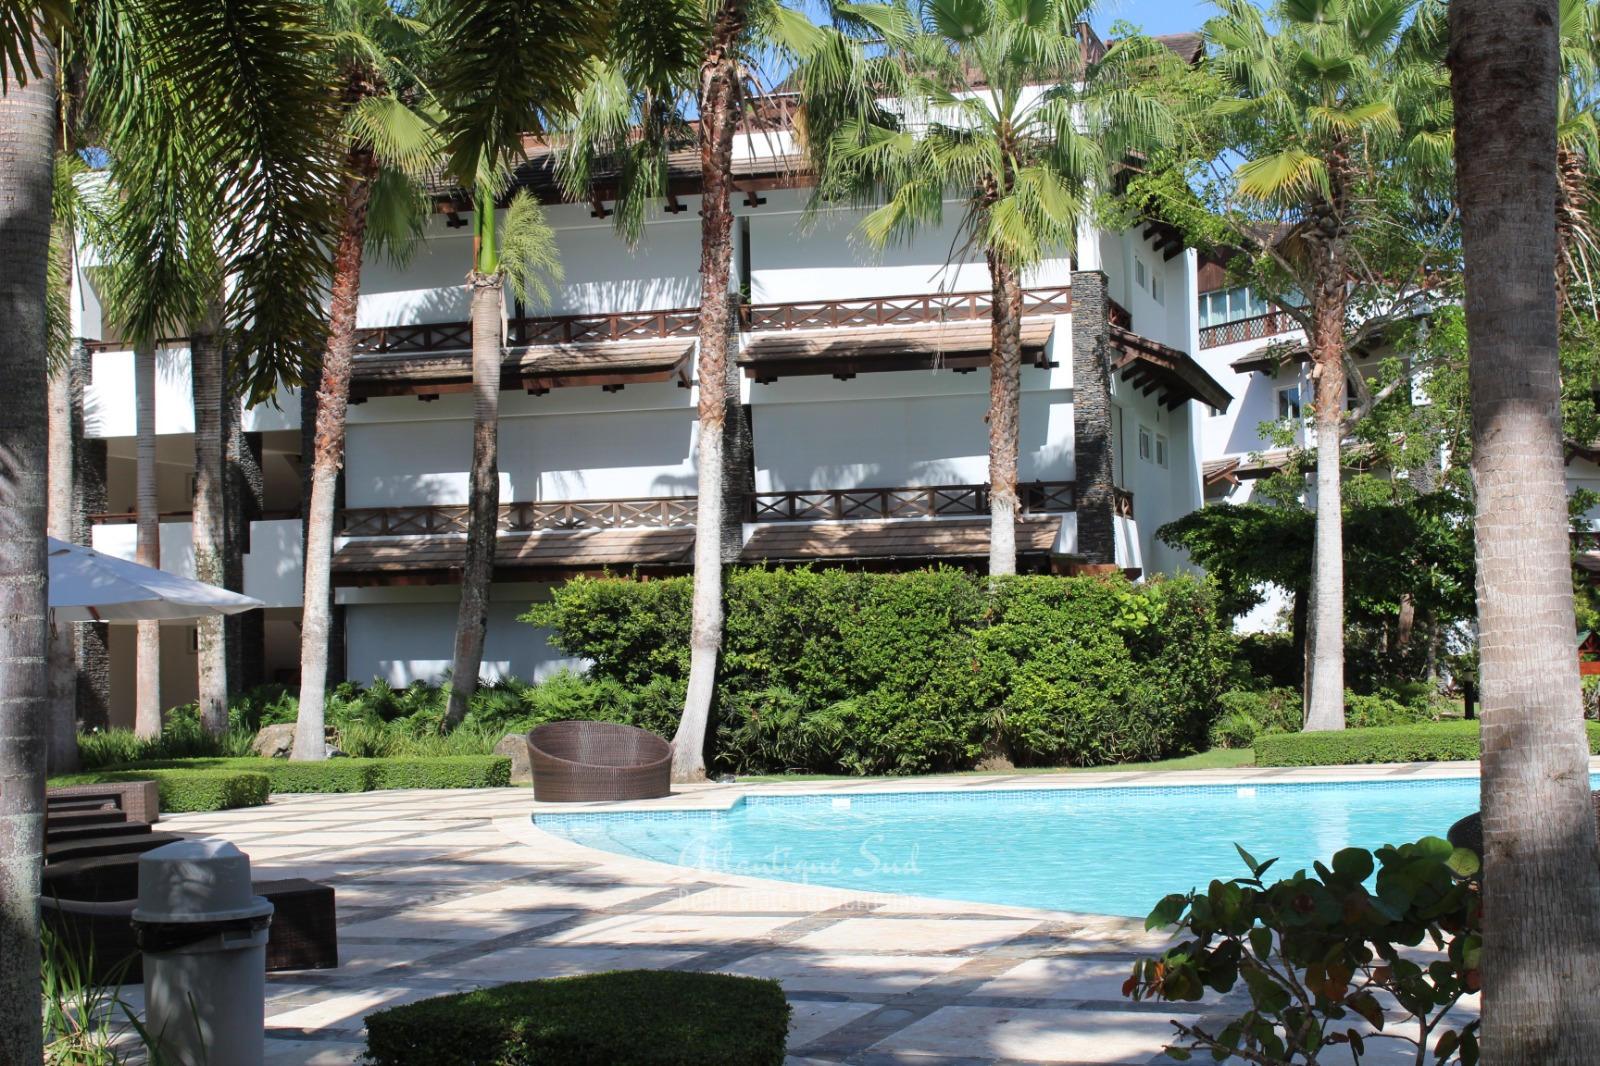 Apartments near the beach real estate las terrenas dominican republic48.jpg